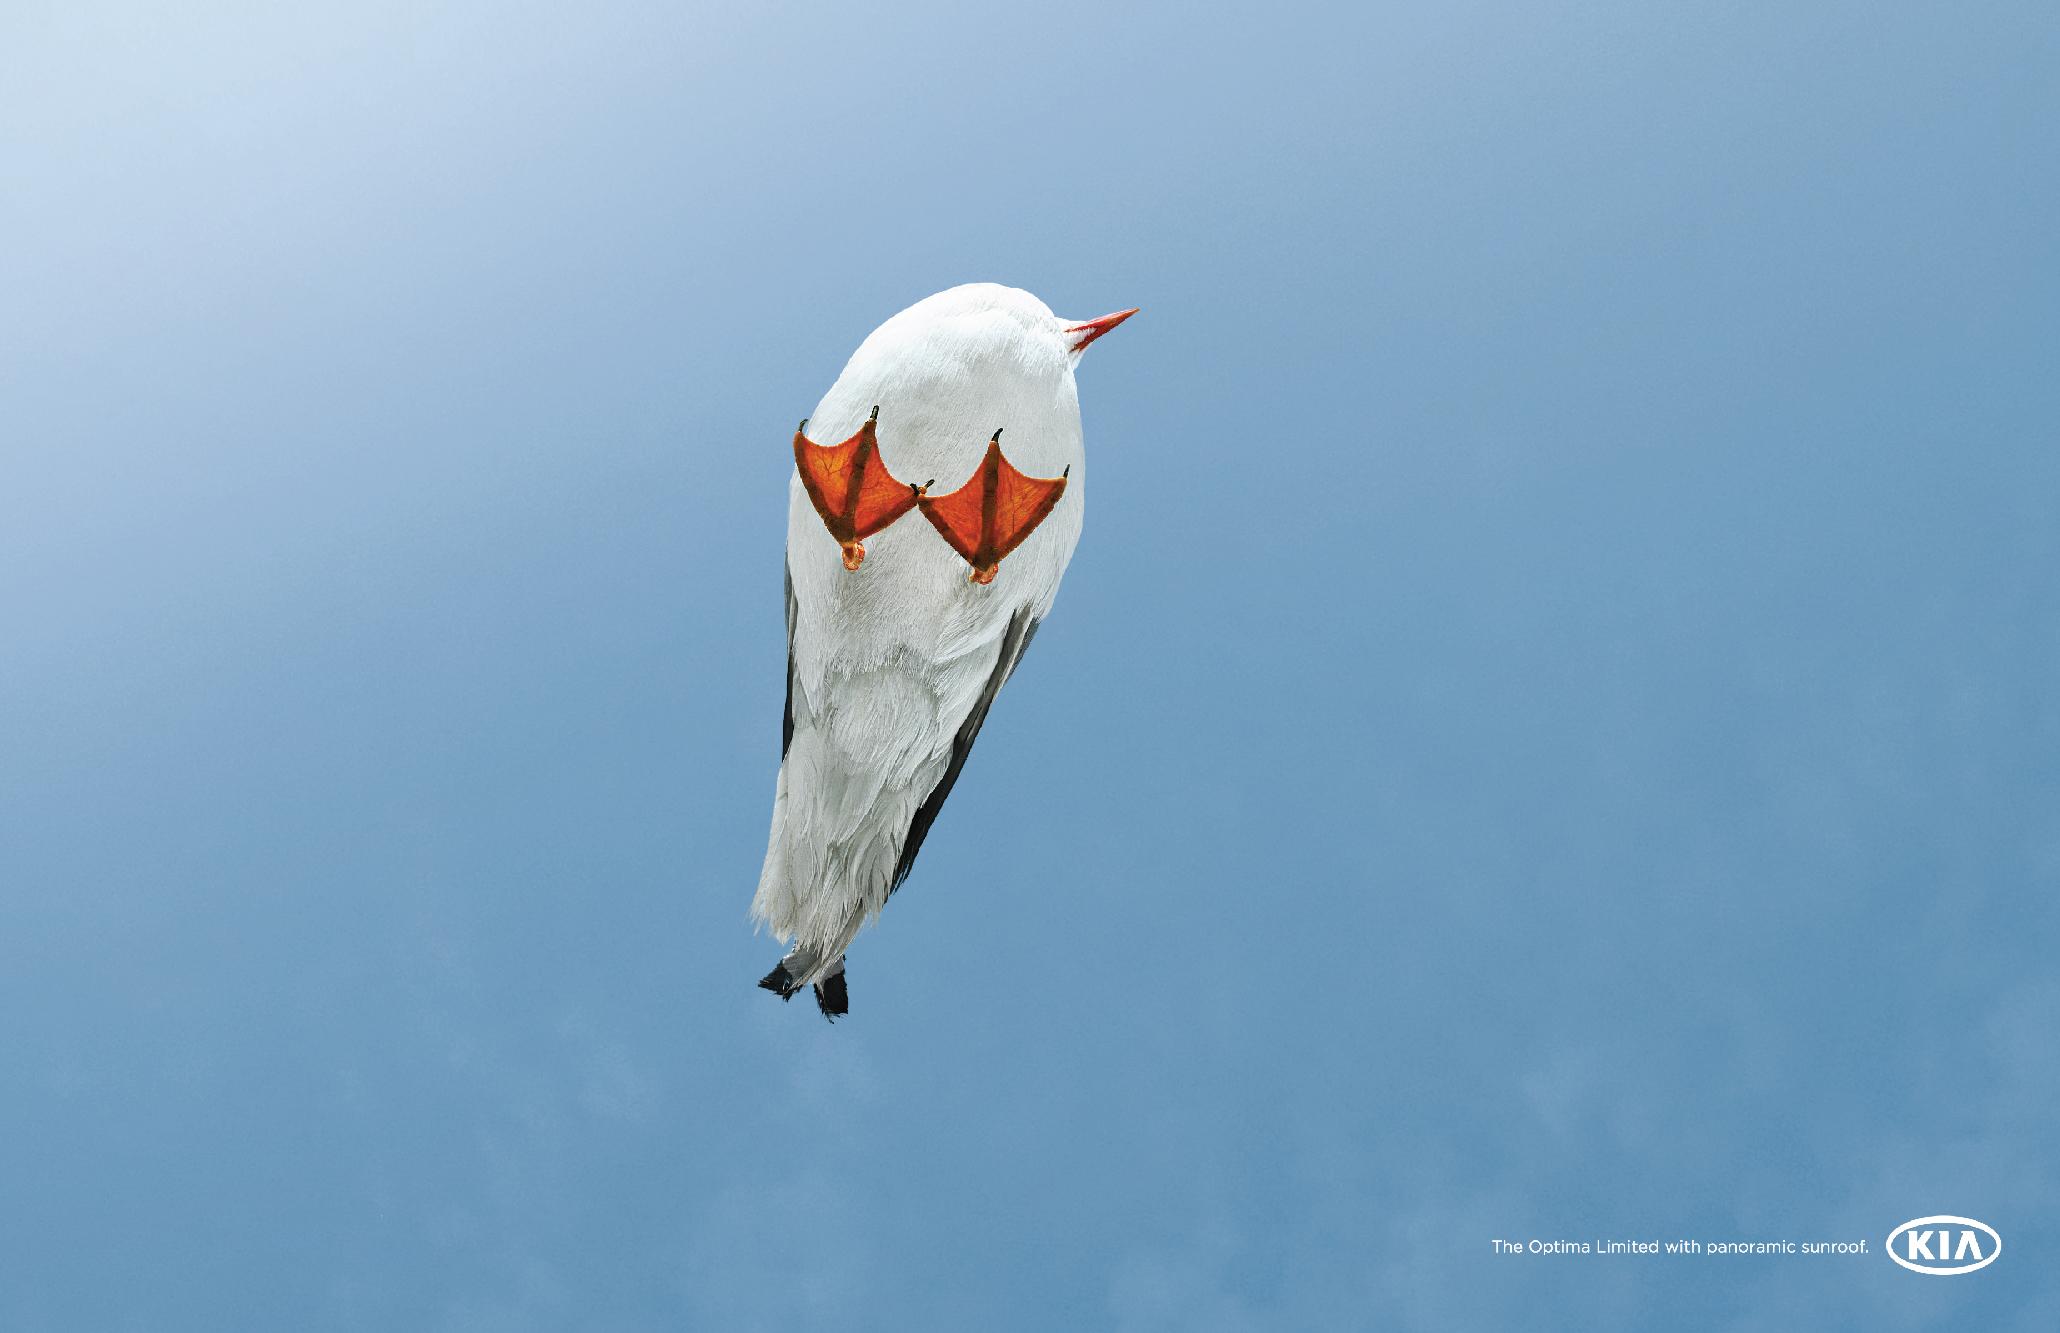 kia_optima_bird.jpg